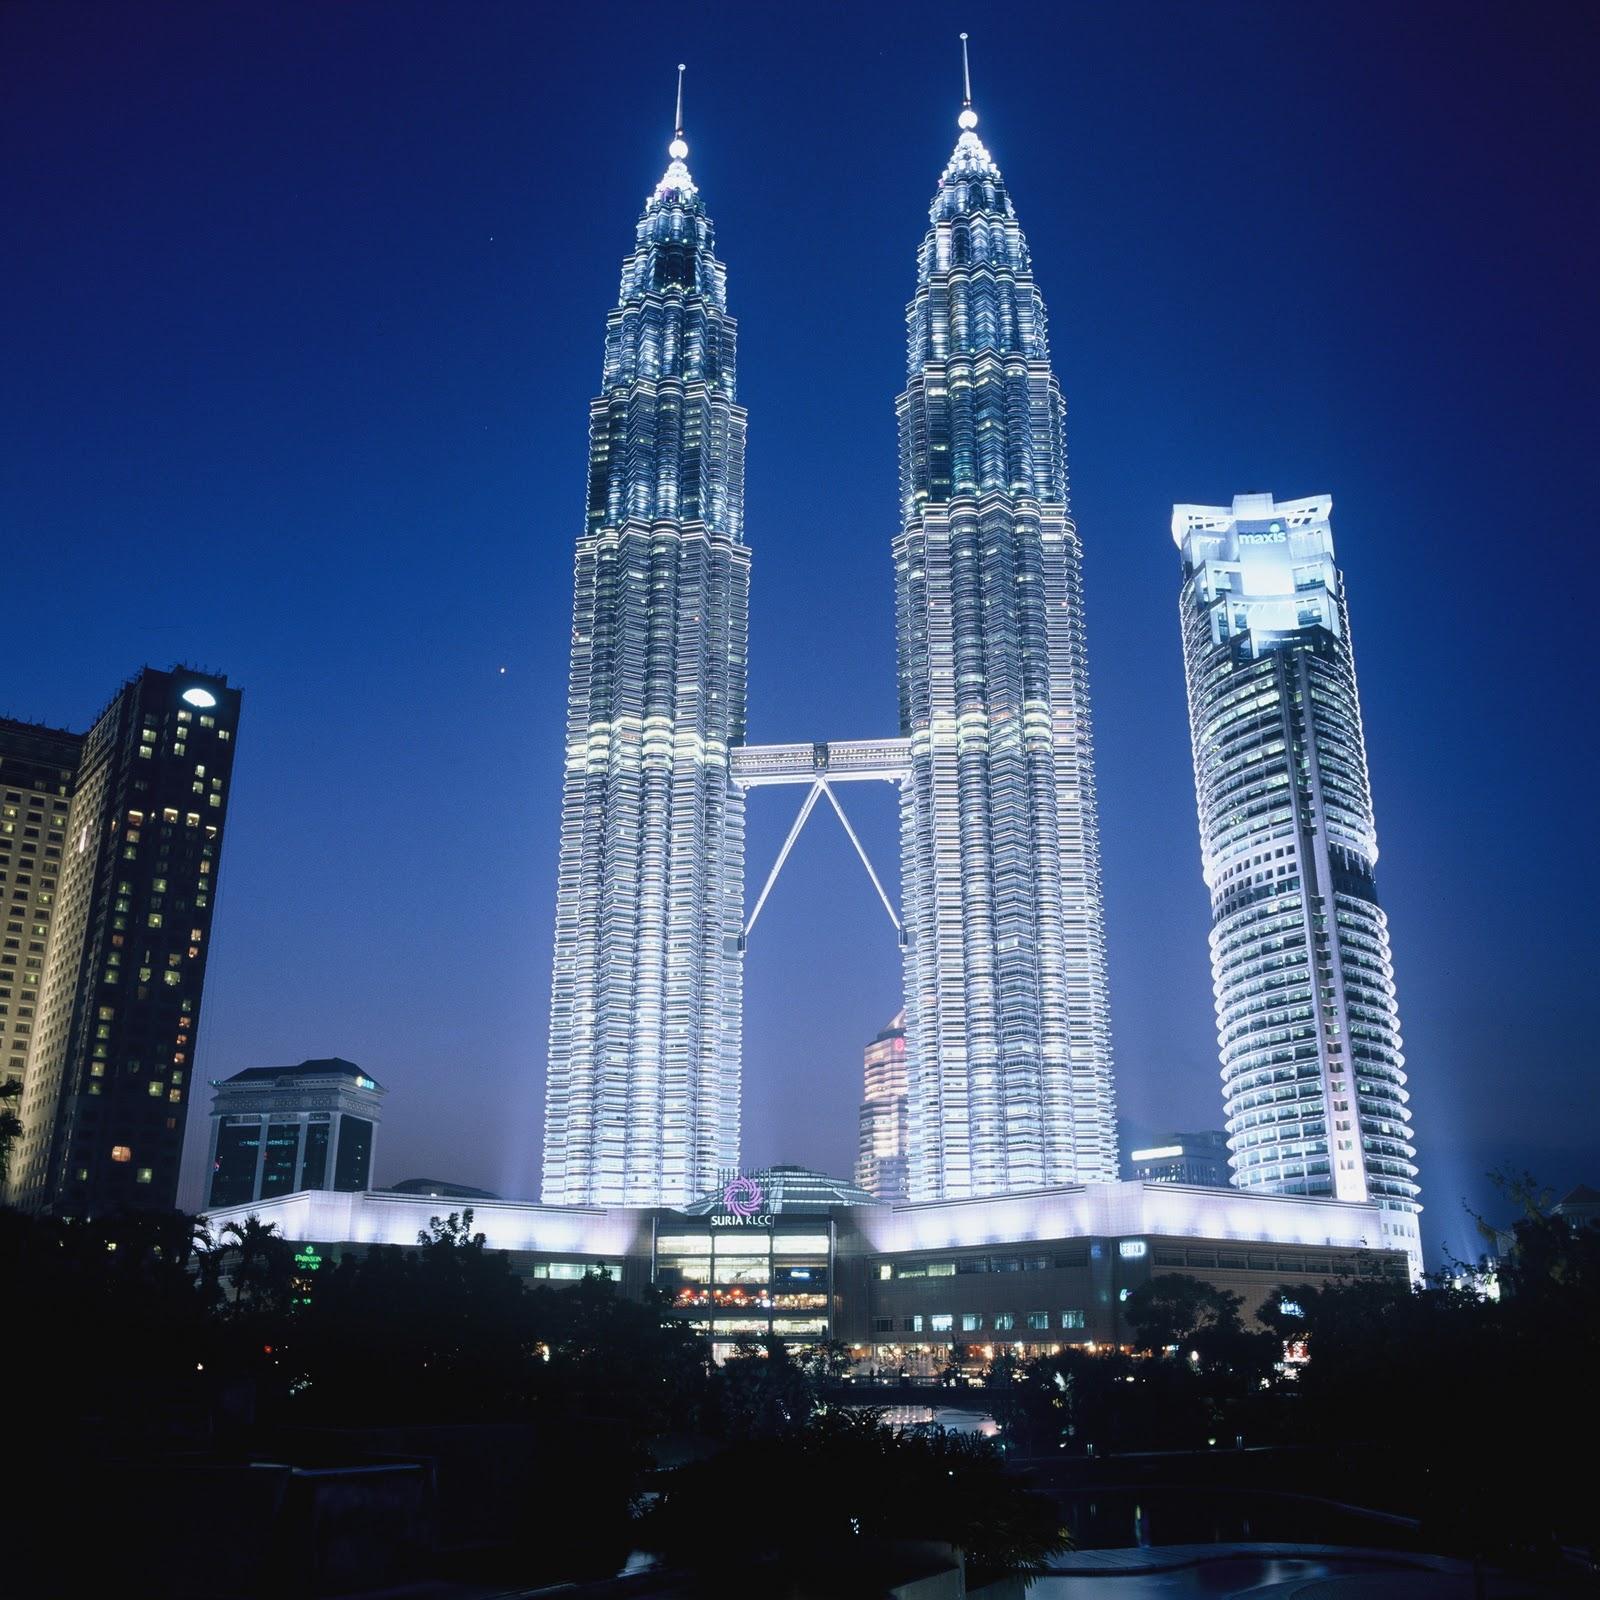 construction co ltd malaysia syarikat jasatera sdn bhd malaysia 1600x1600